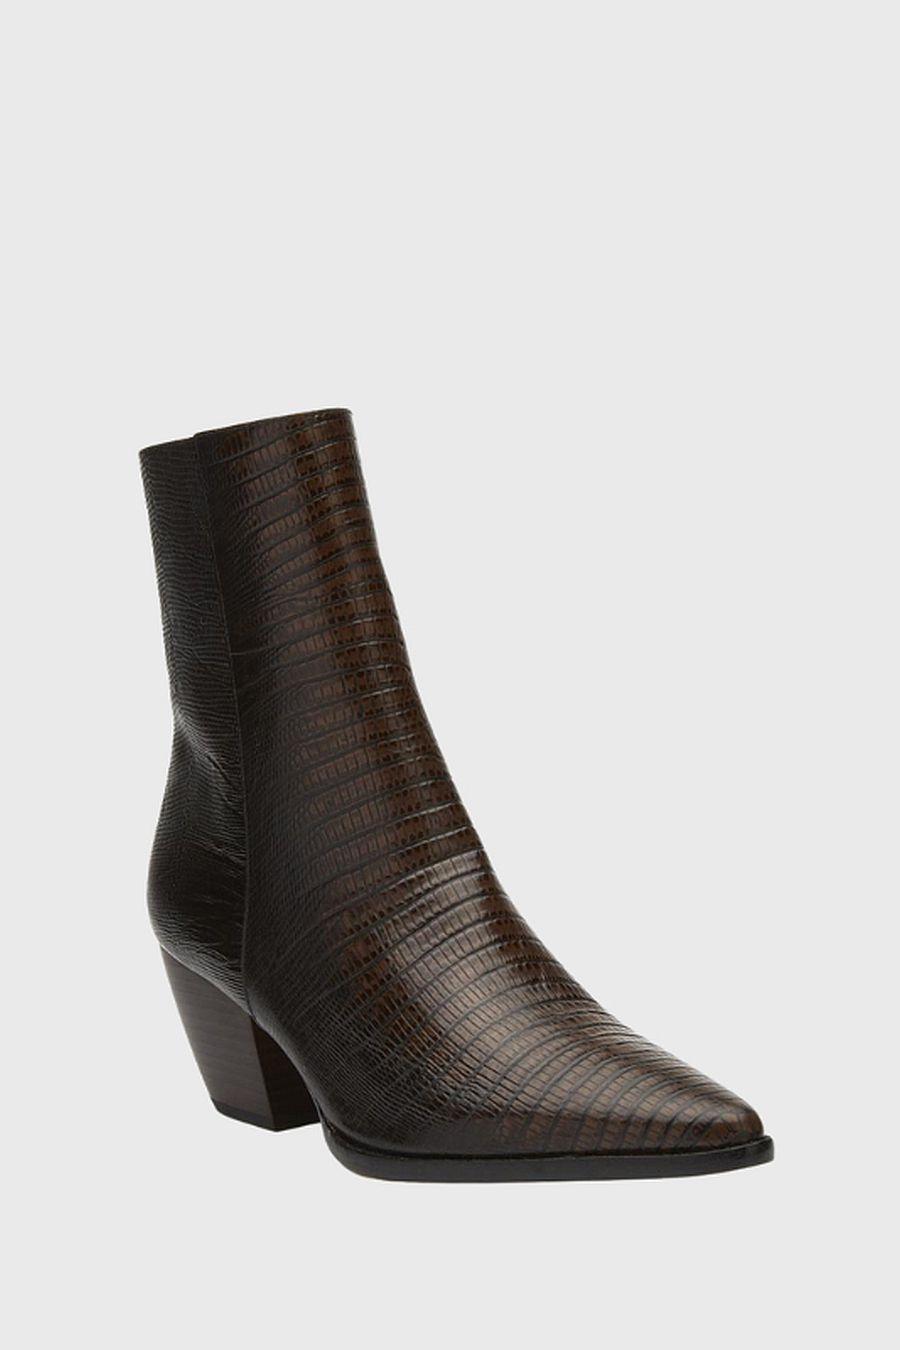 Matisse Footwear Caty Ankle Boot - chocolate lizard